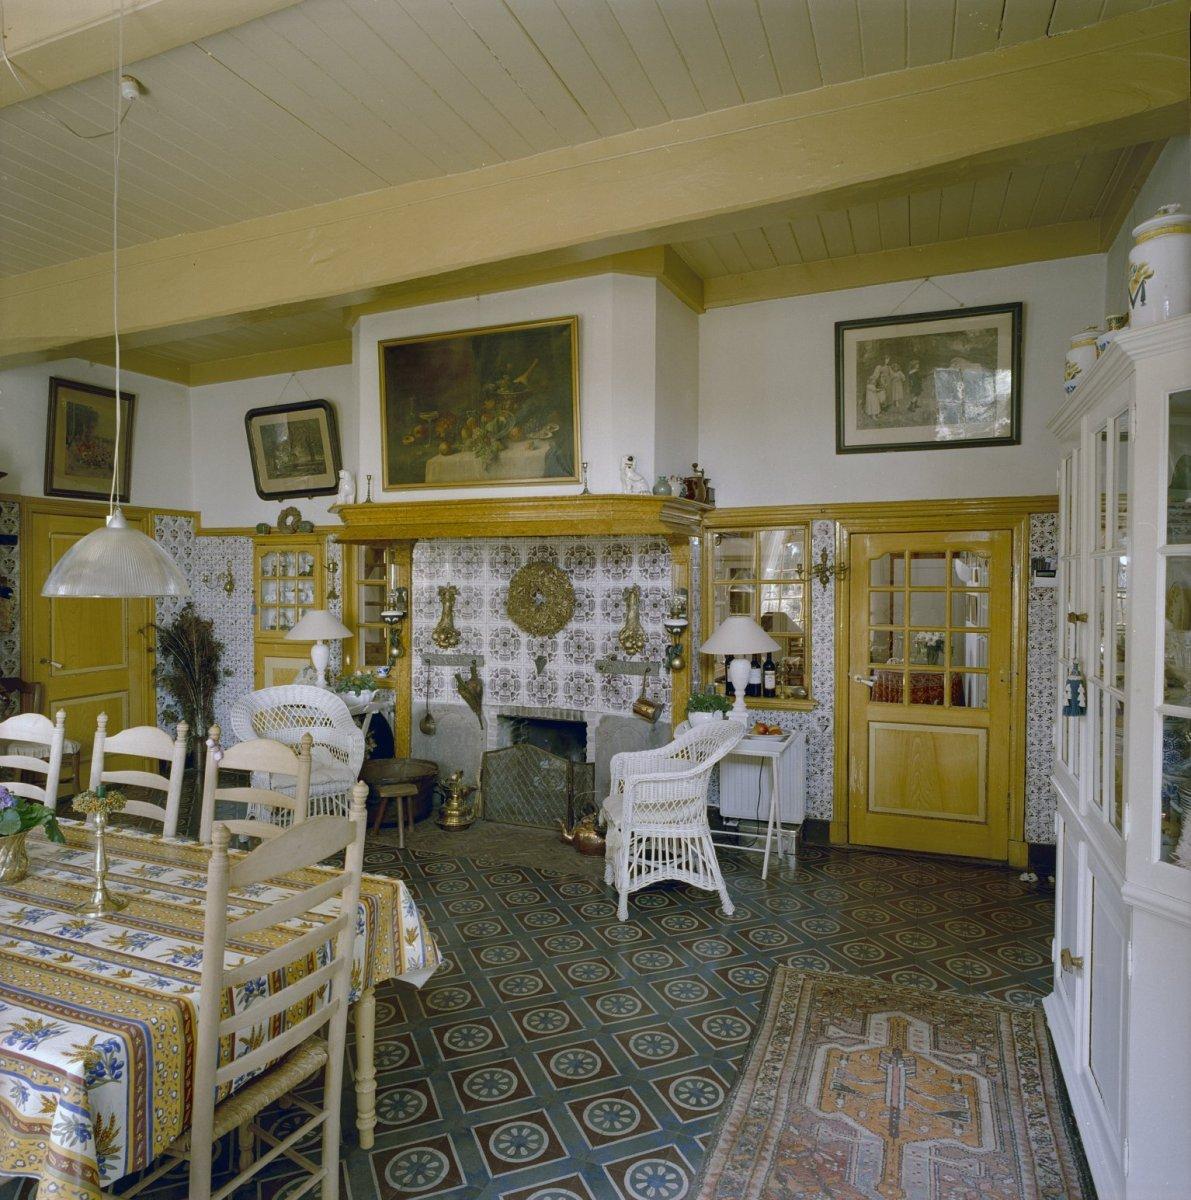 File interieur woonkamer boerderij markelo 20329913 for Interieur 1900